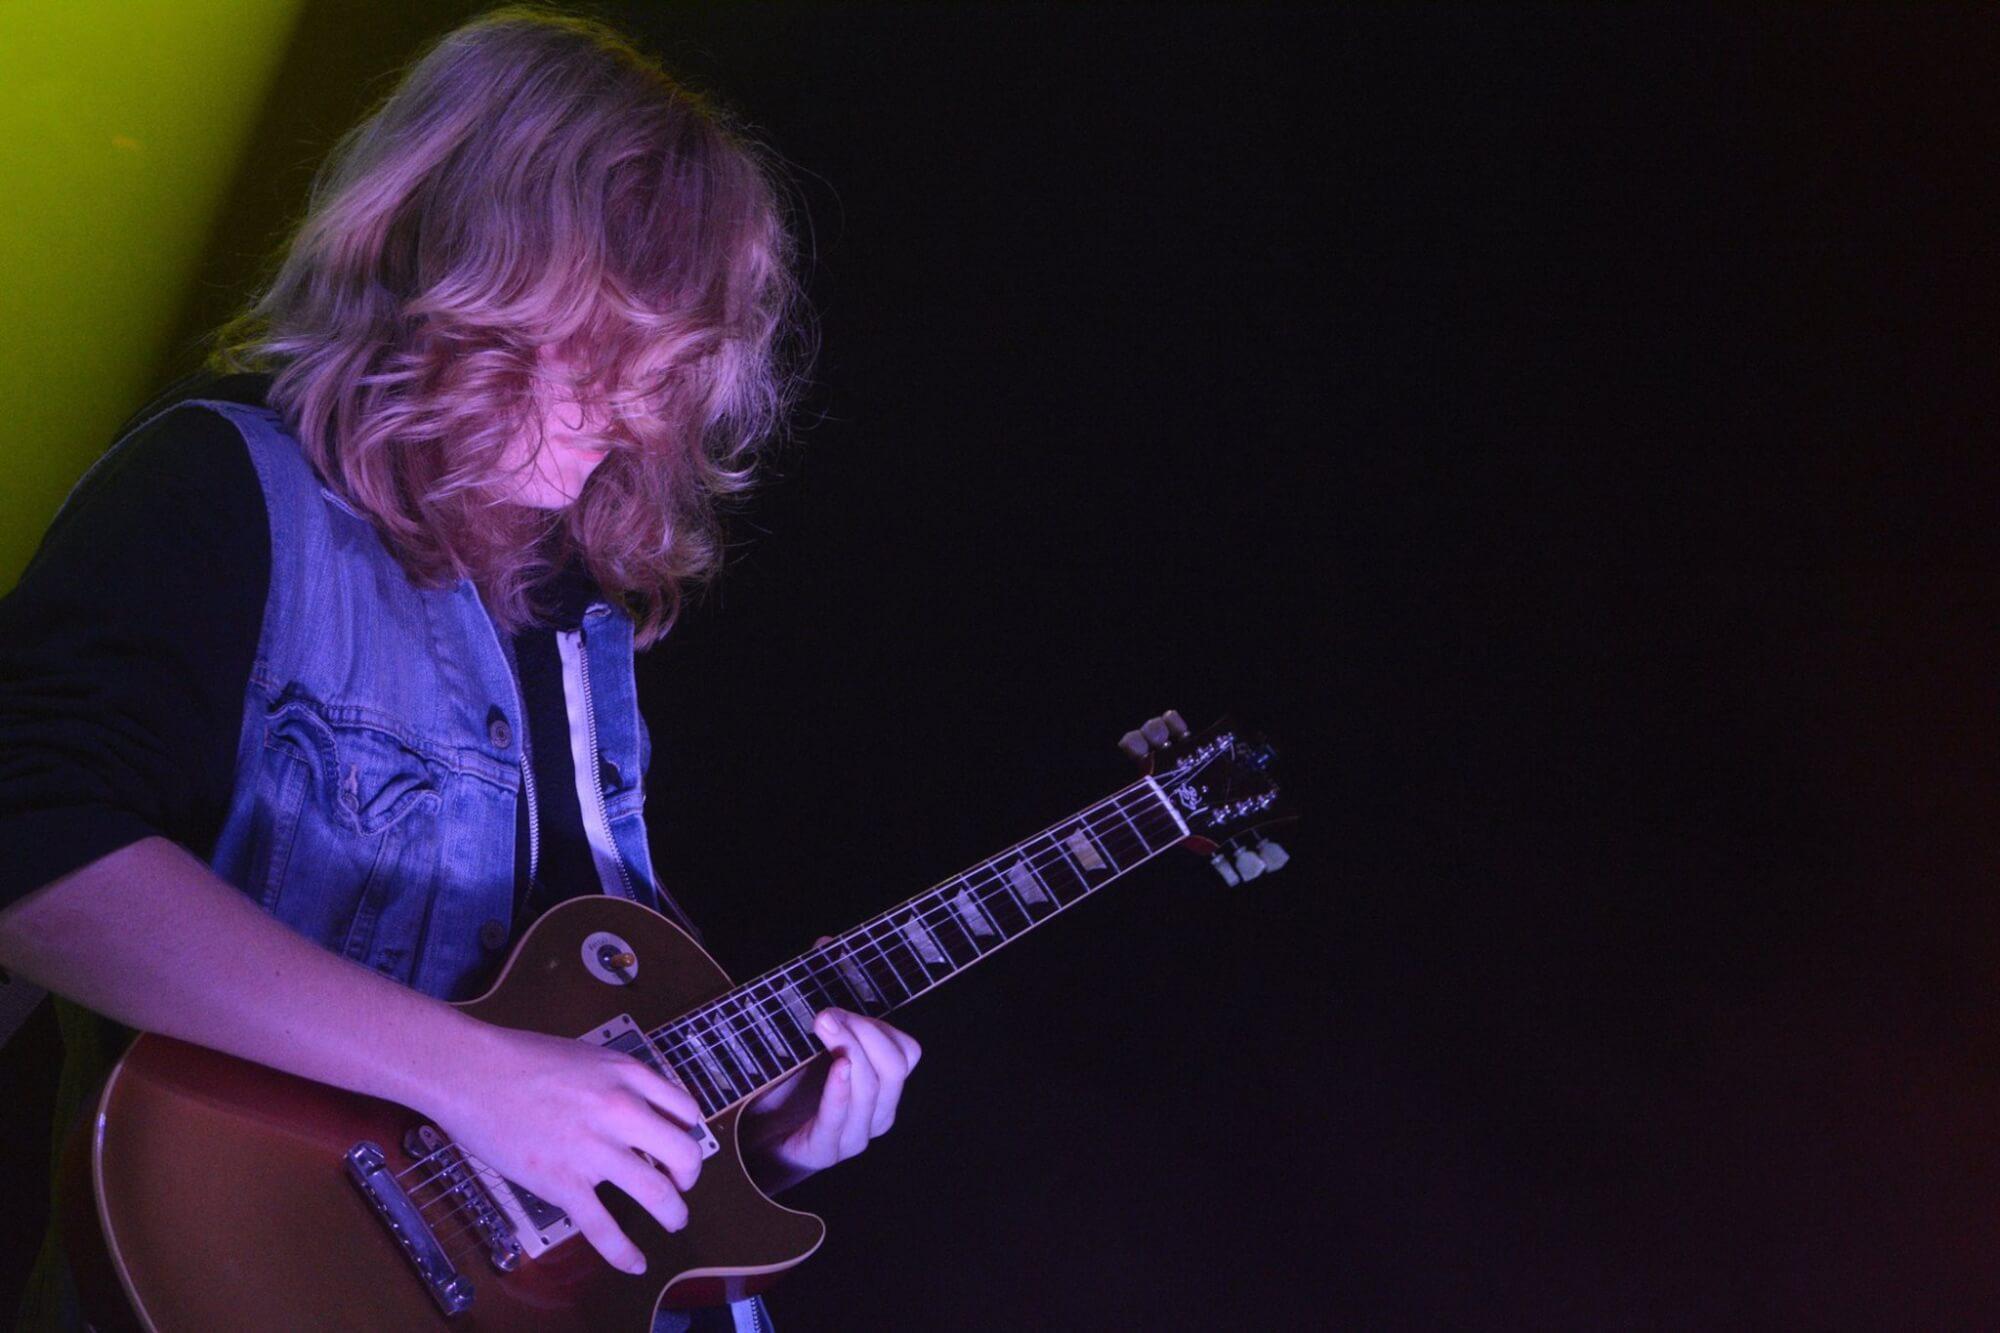 Seth performing a guitar solo.